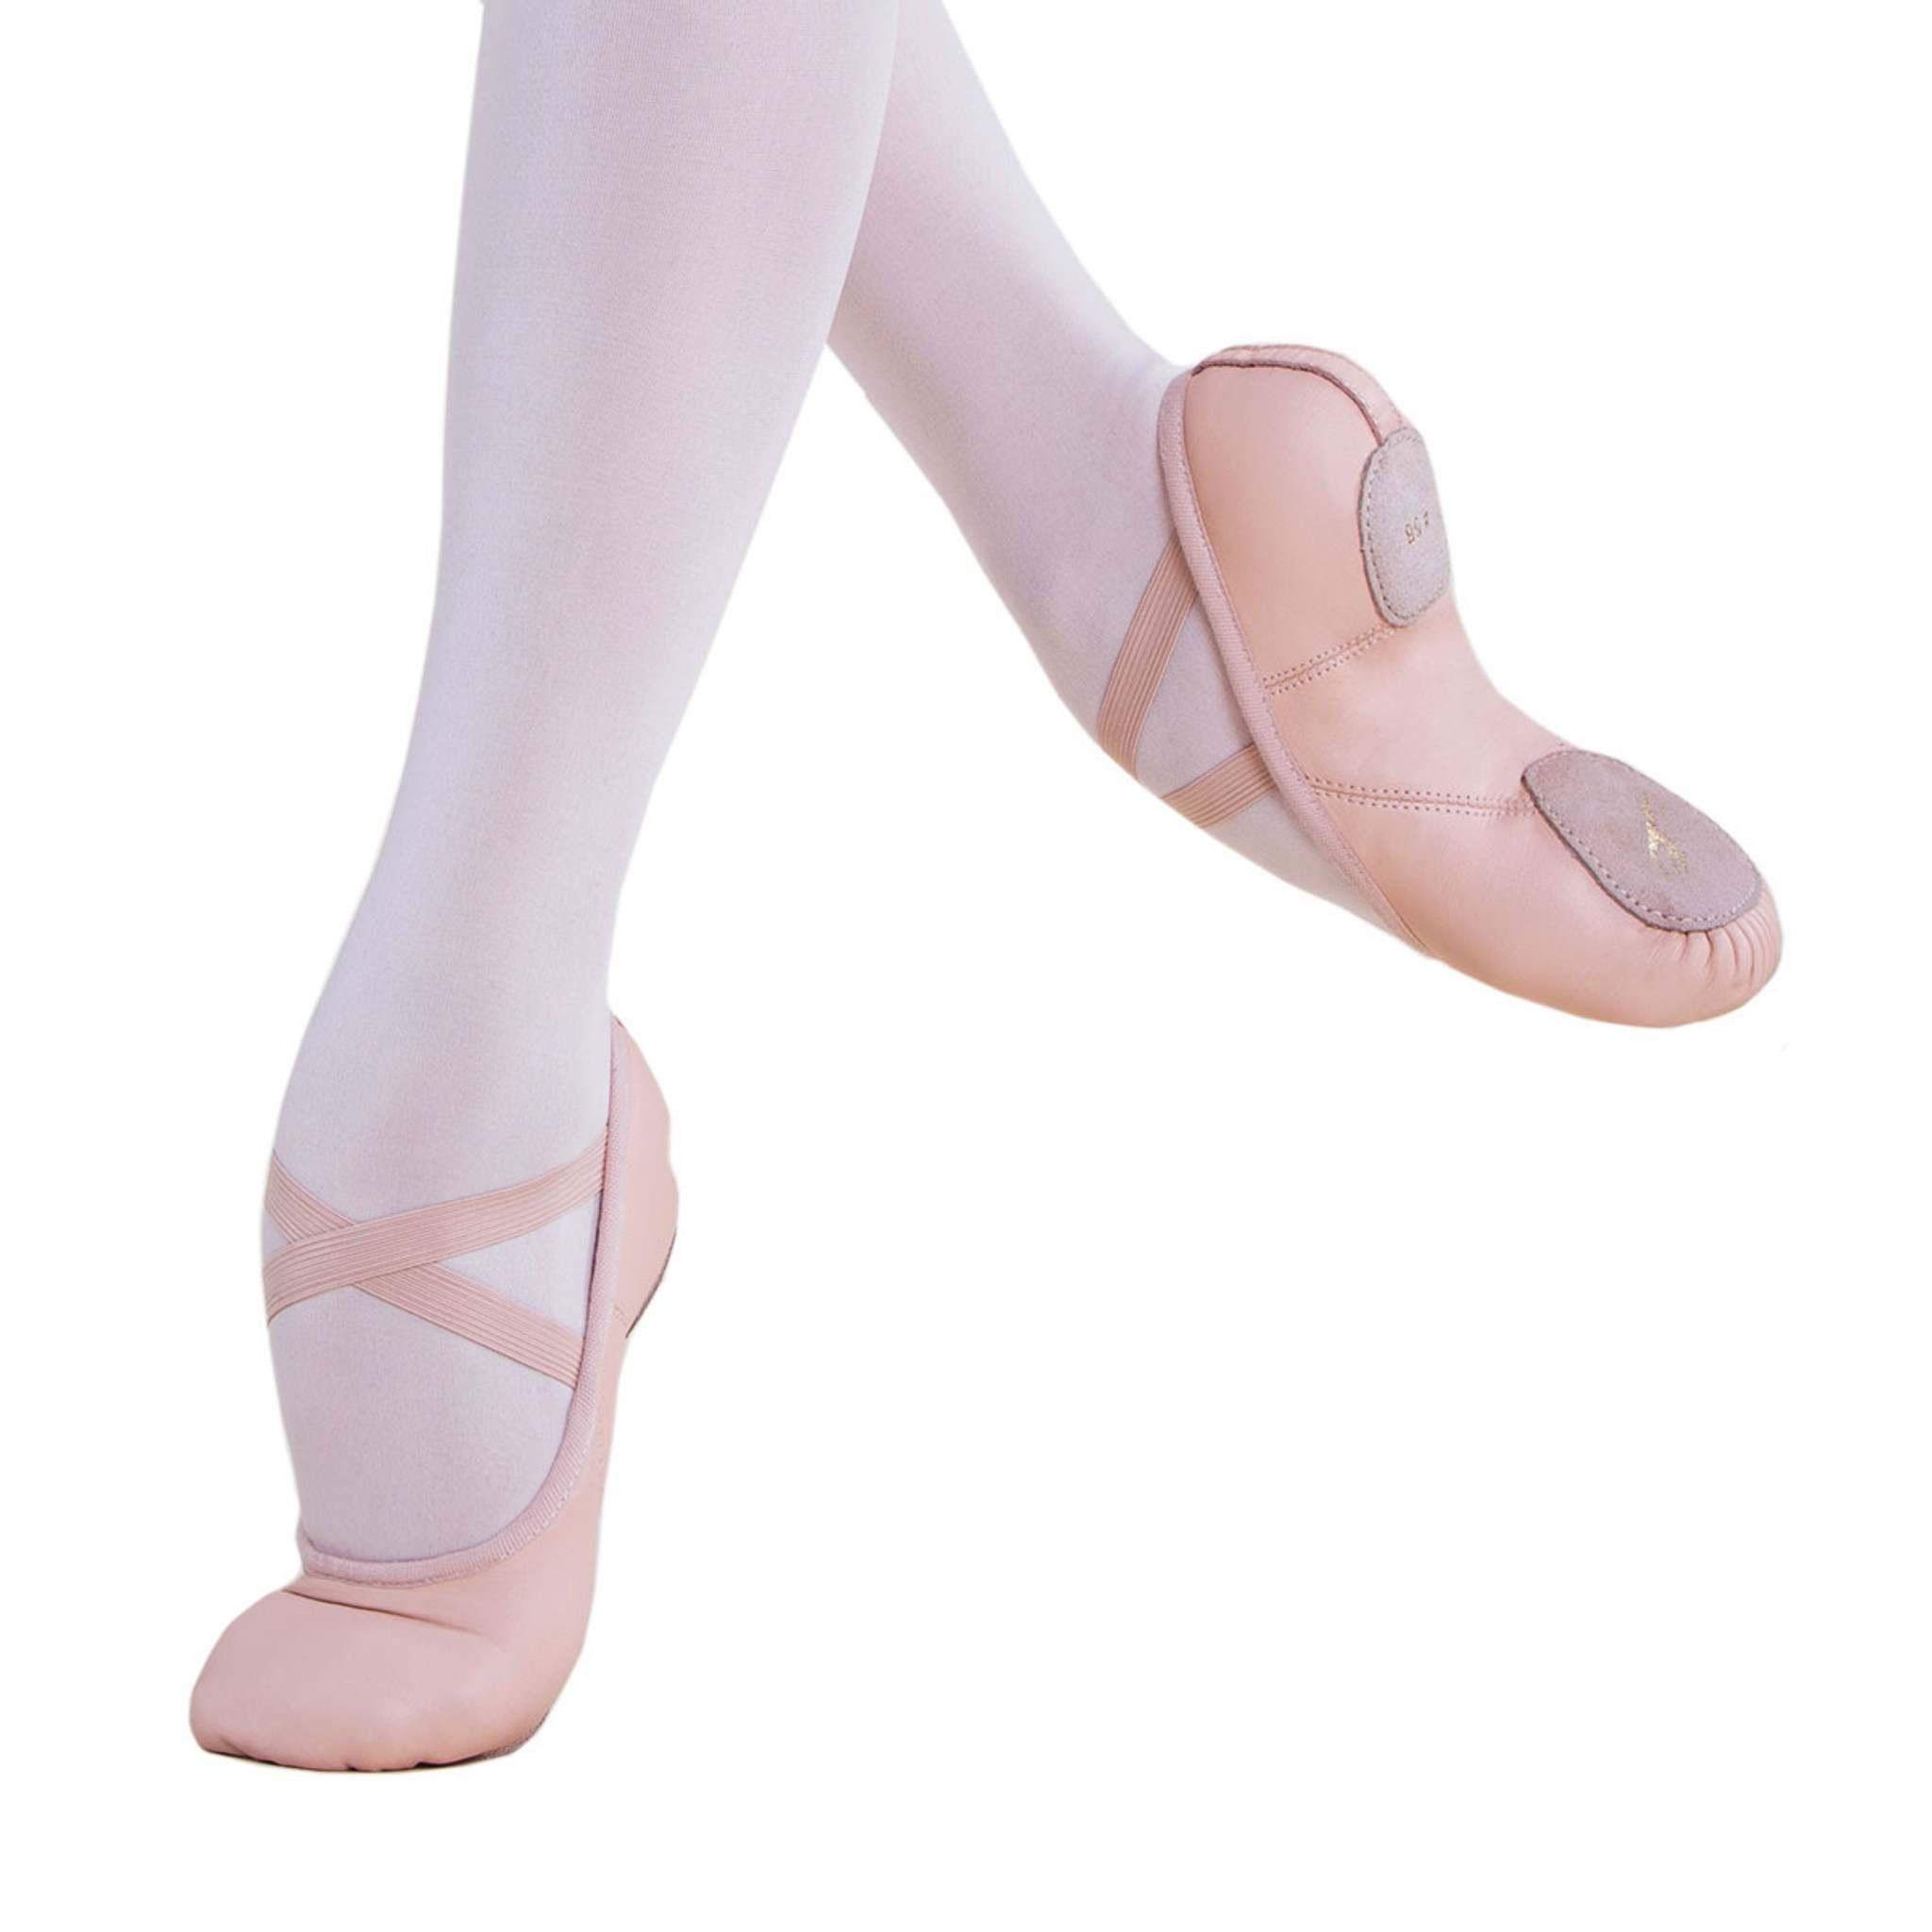 Energetiks Revelation Ballet Shoe - Split Sole Child